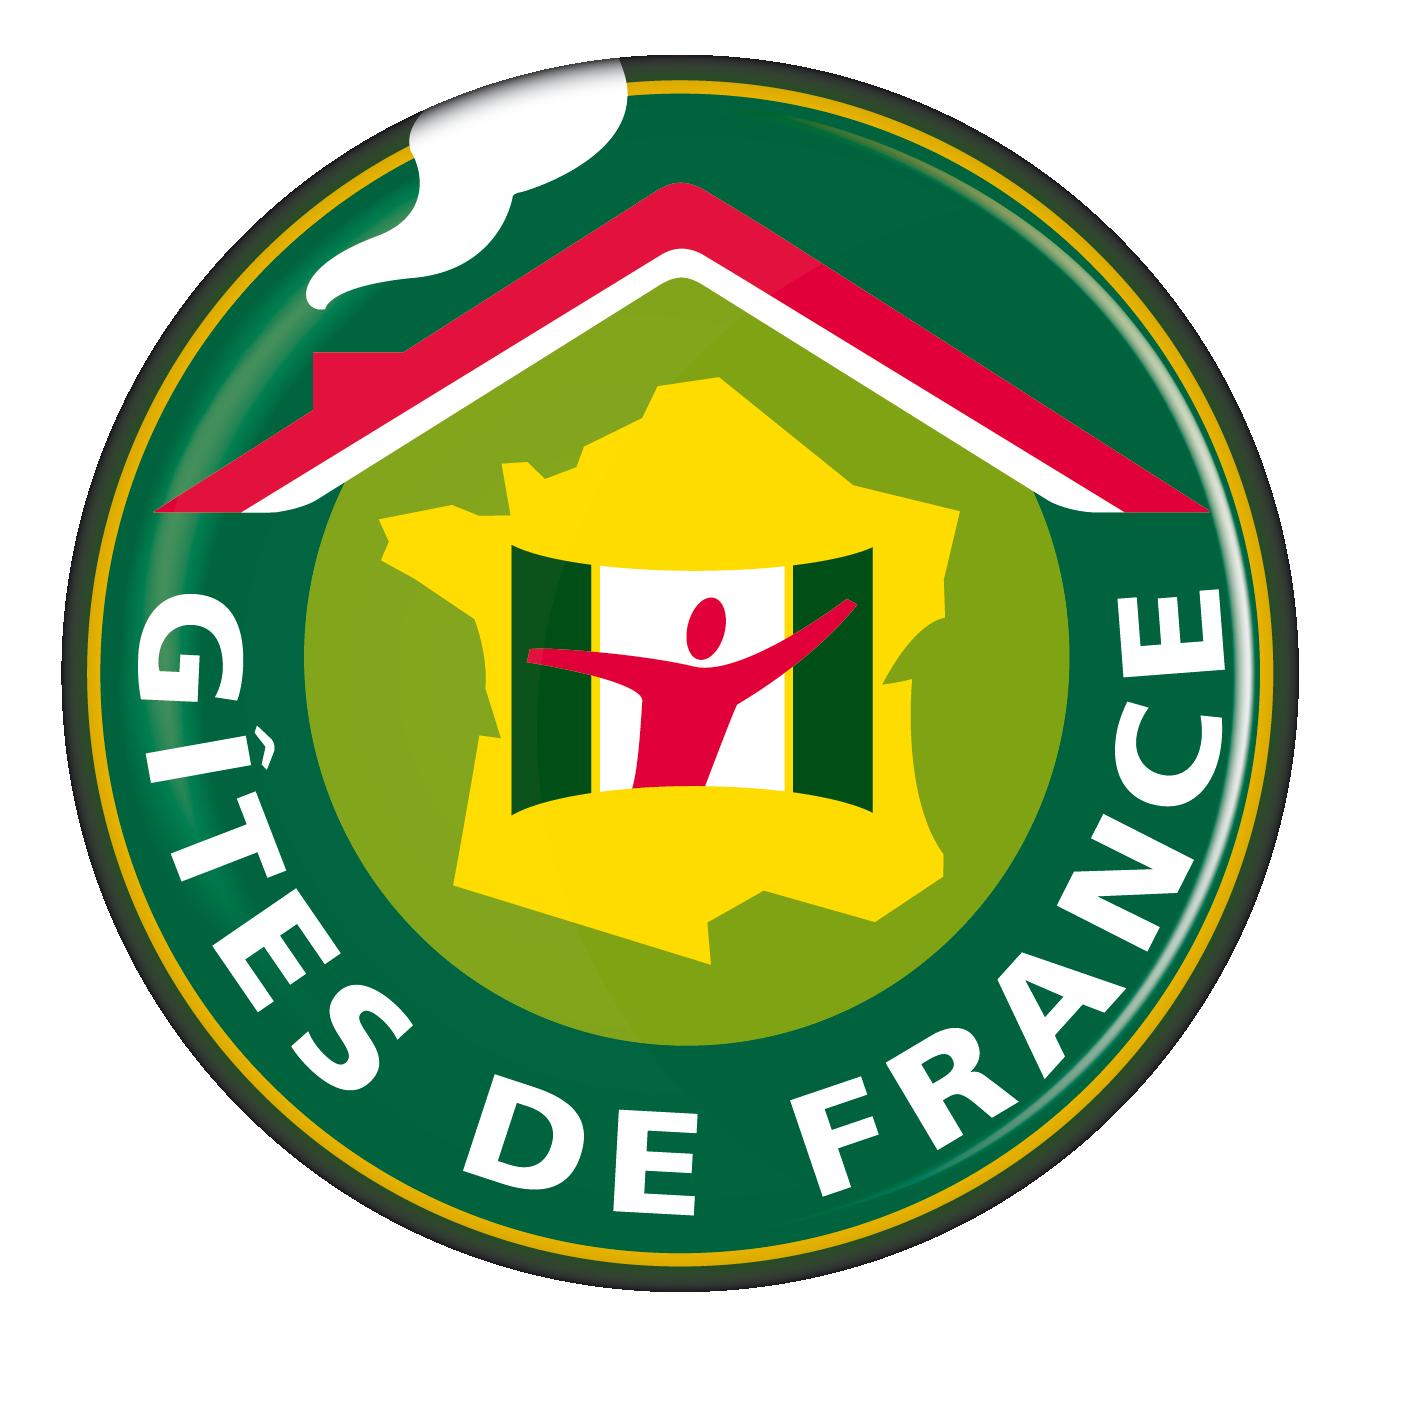 Gîtes des France